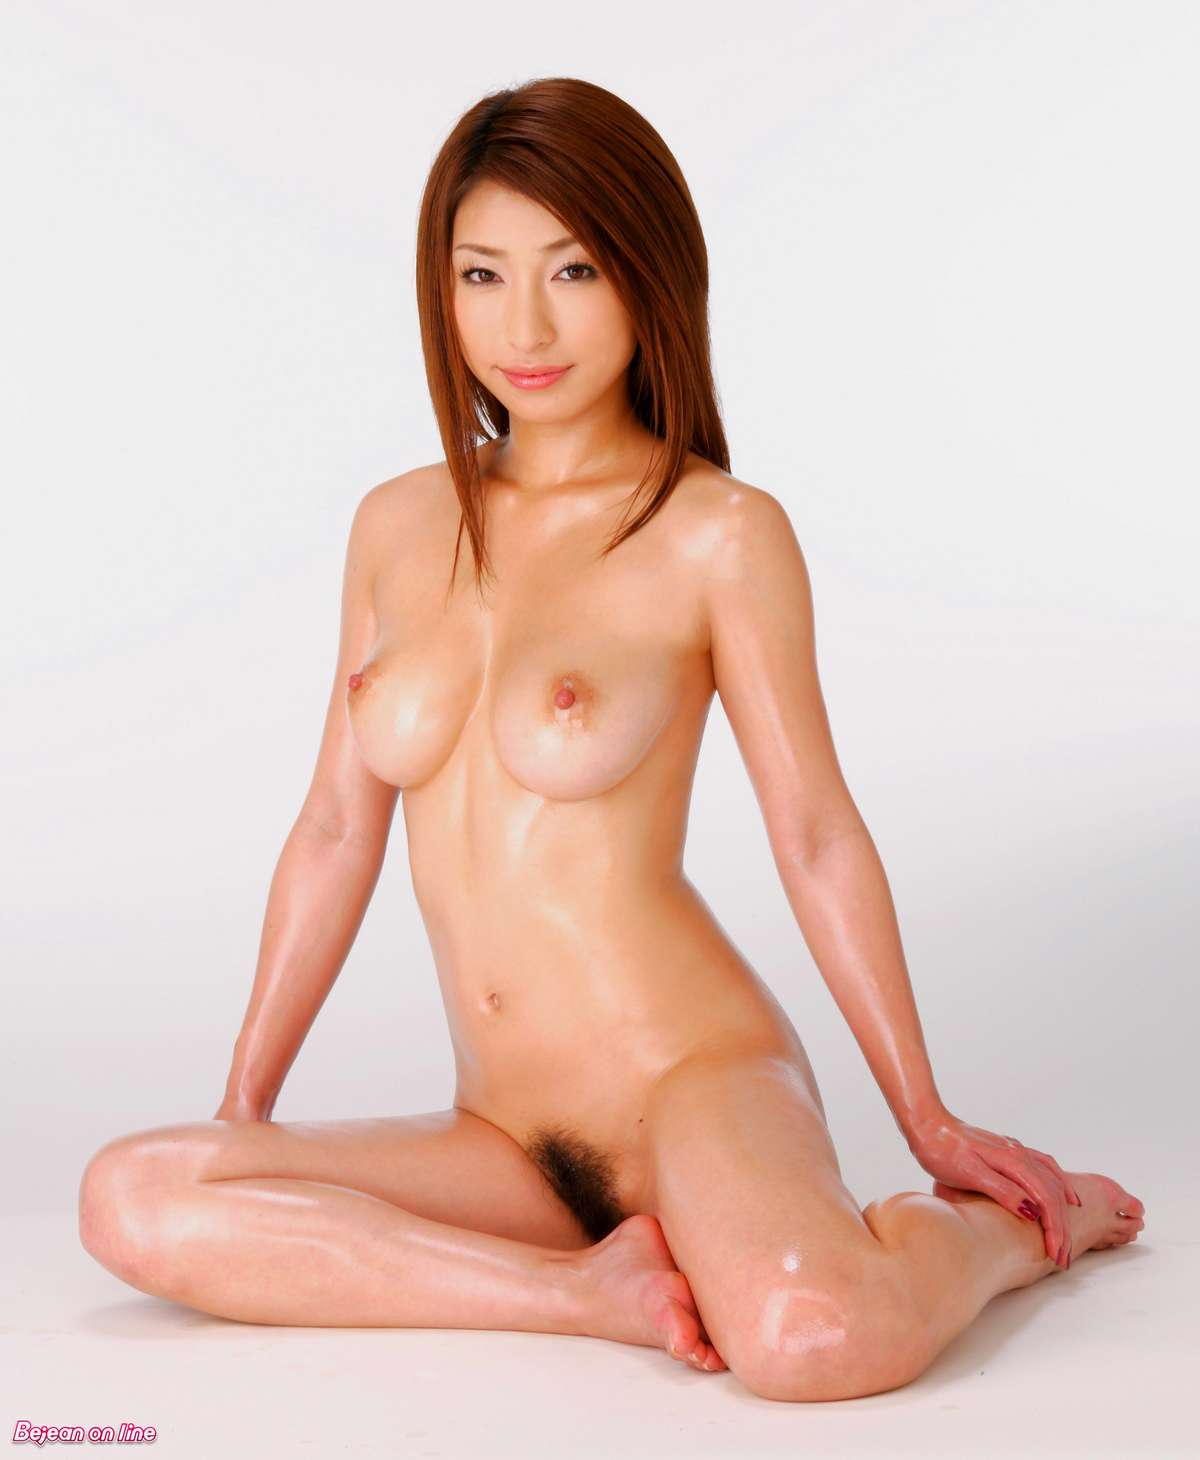 Malay escort nude pic